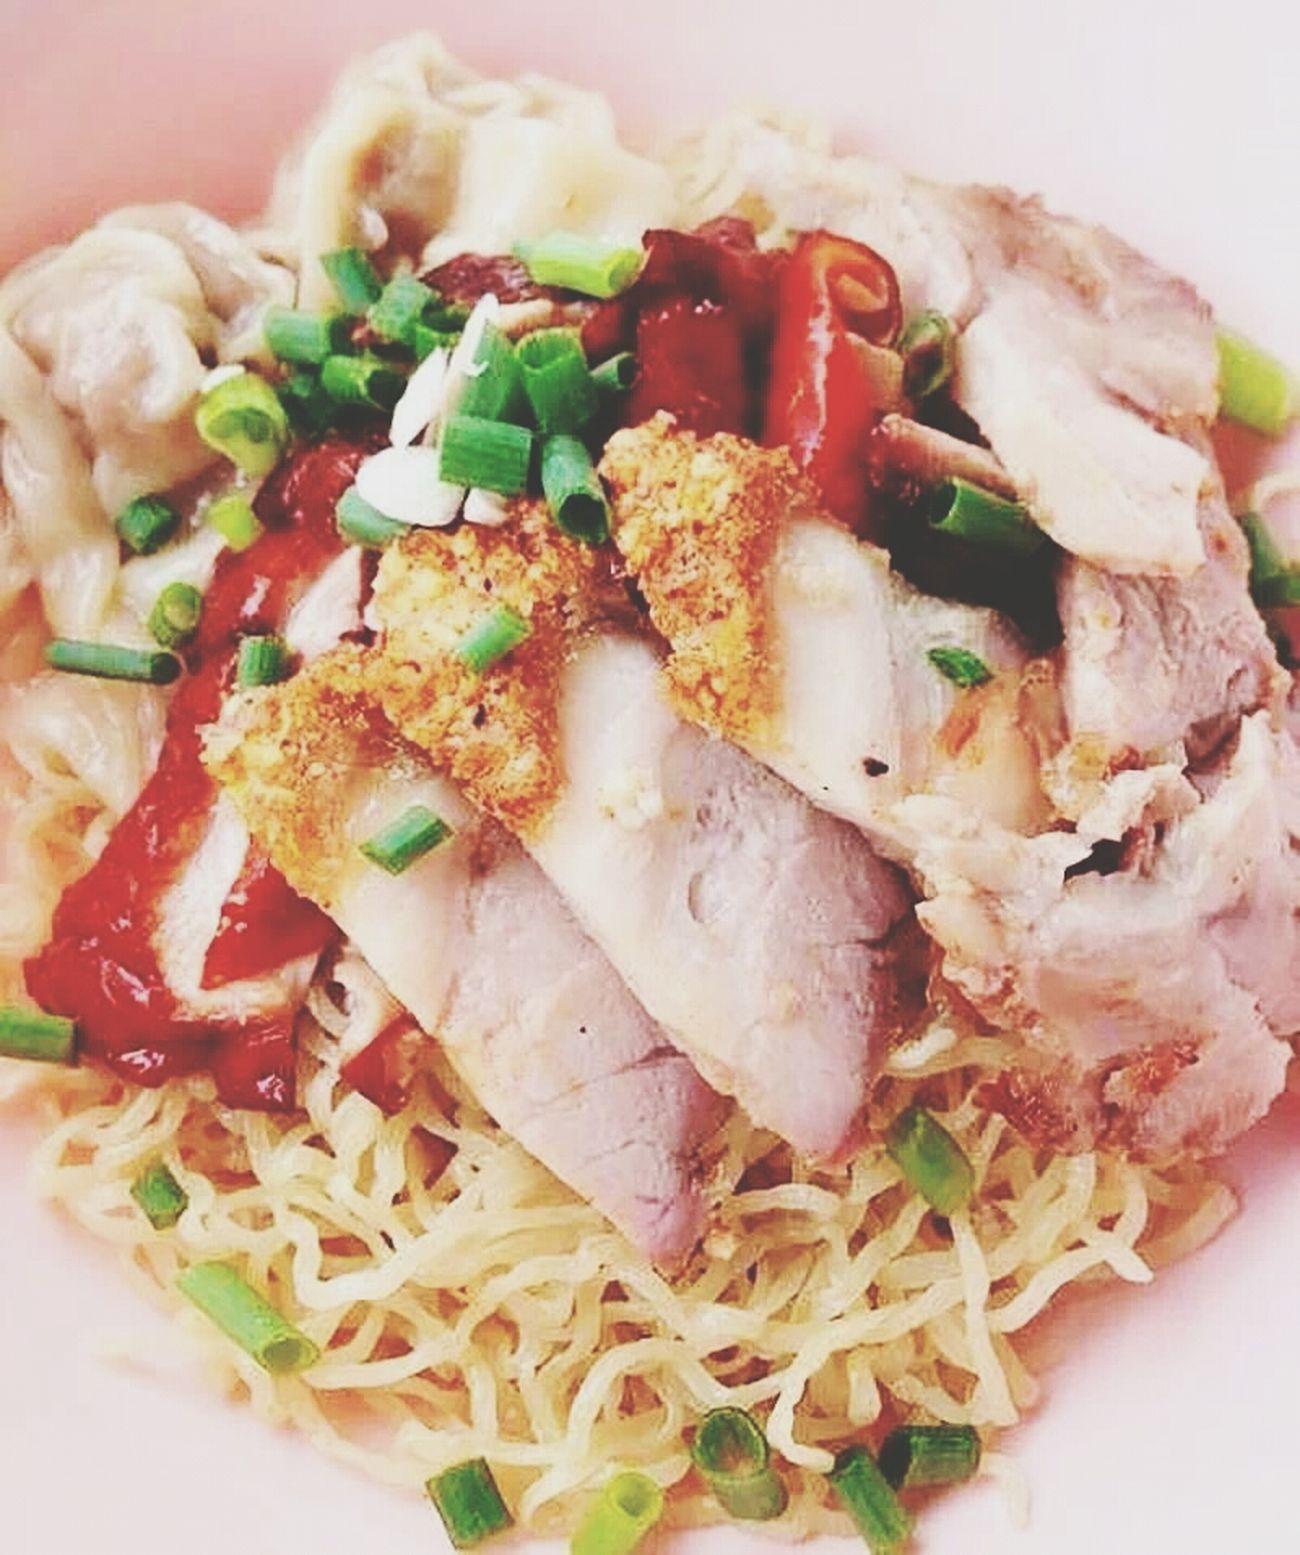 Noodles Thaifood Yum Yum Delicious Hello World